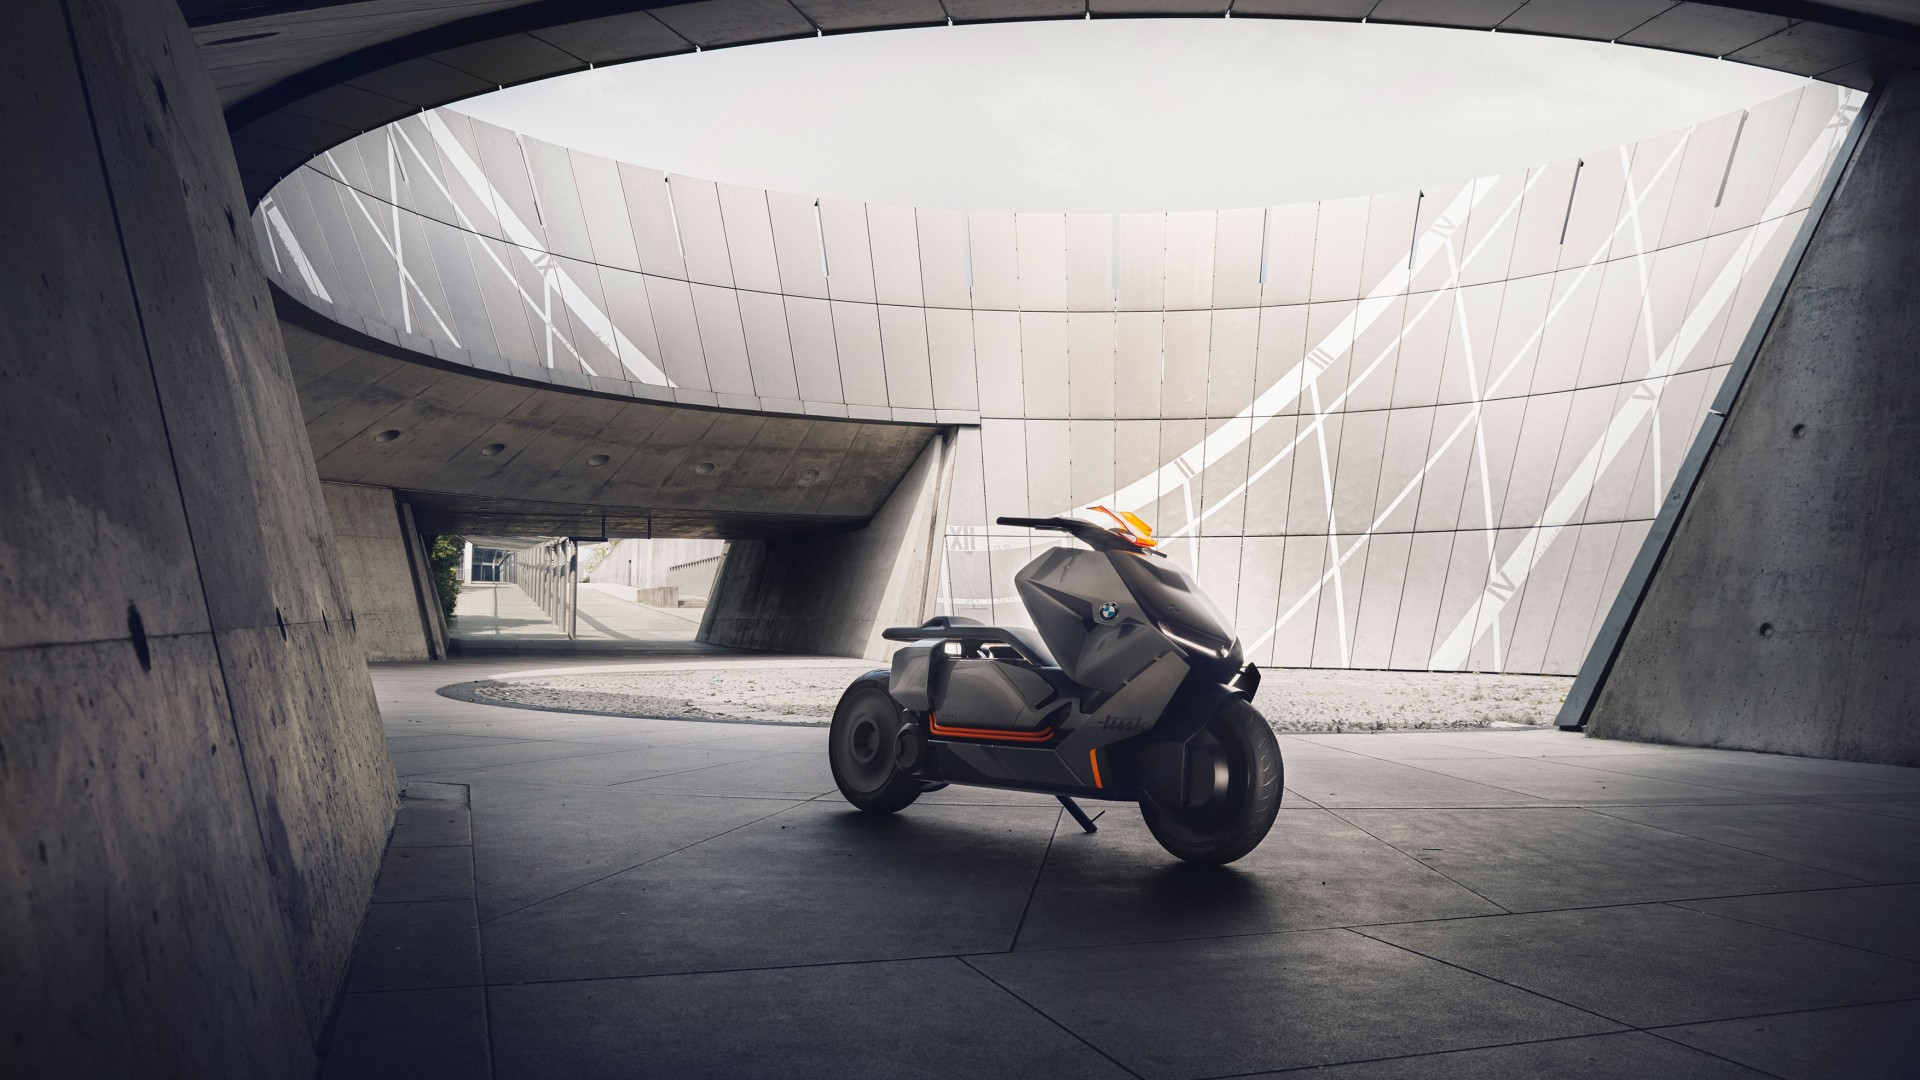 Wallpaper Bmw Motorrad Concept Link Electric Bike Hd 4k Cars